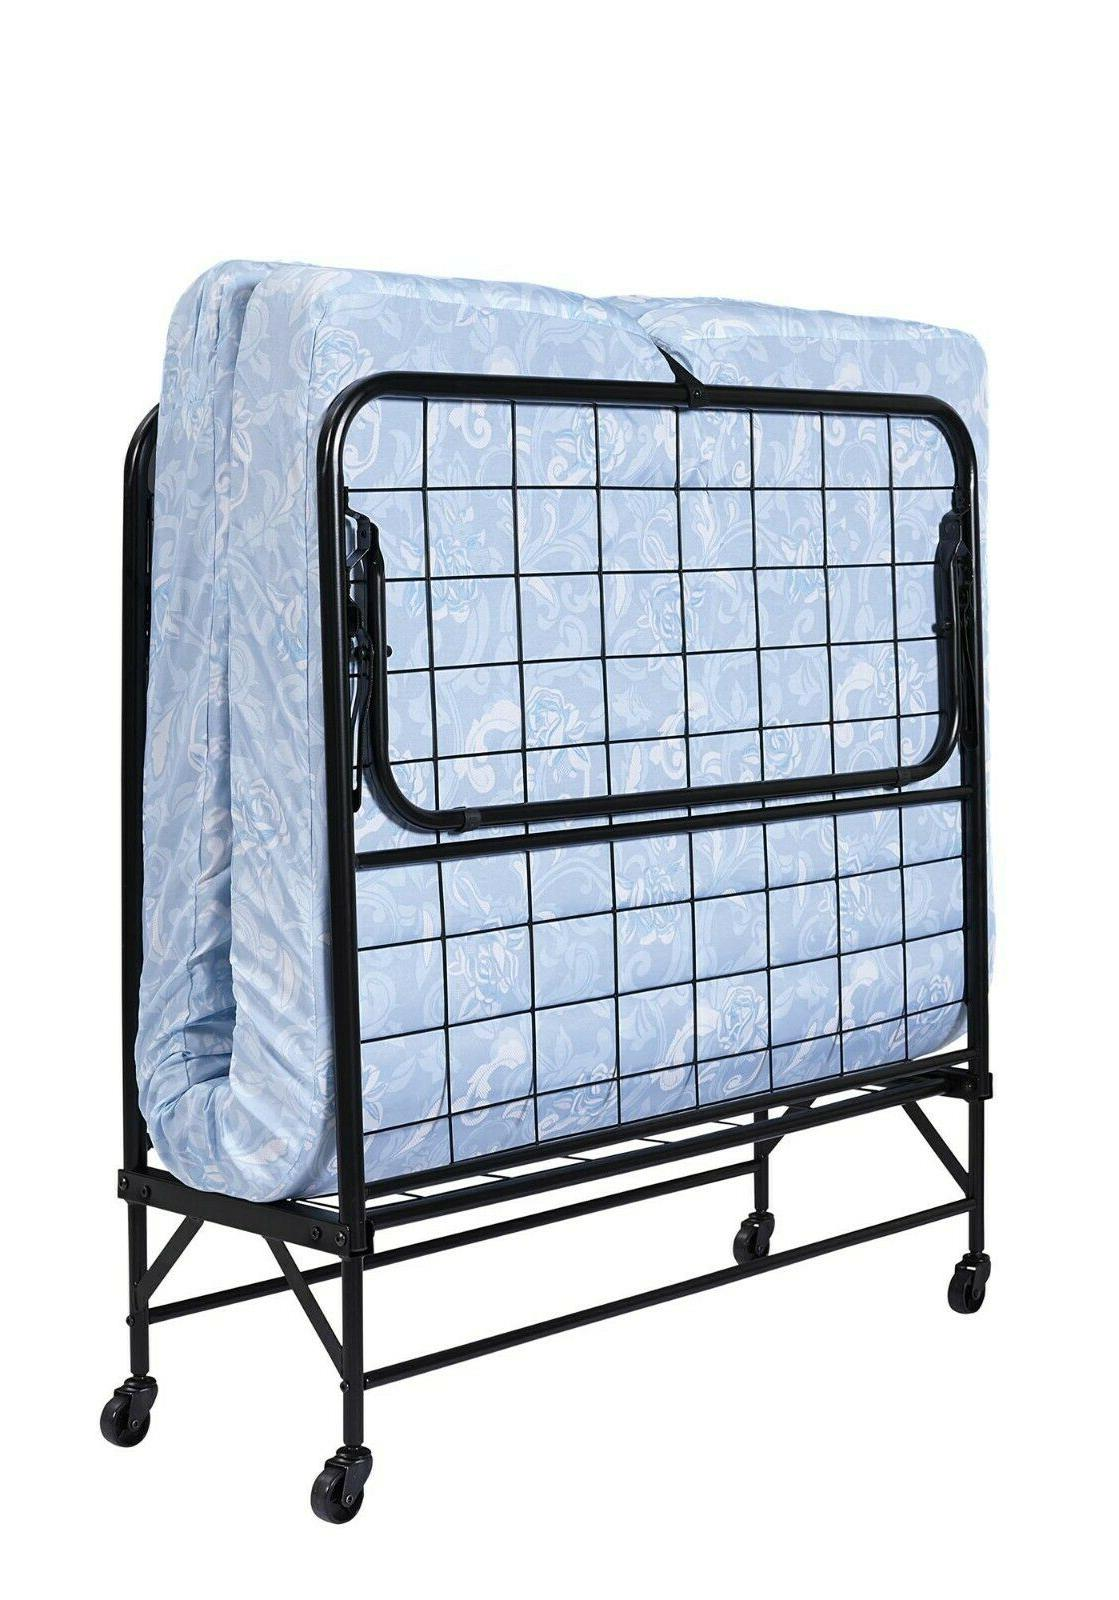 Twin Roll-Away Folding Bed Guest Sleeper Cot Pull-Out w Foam